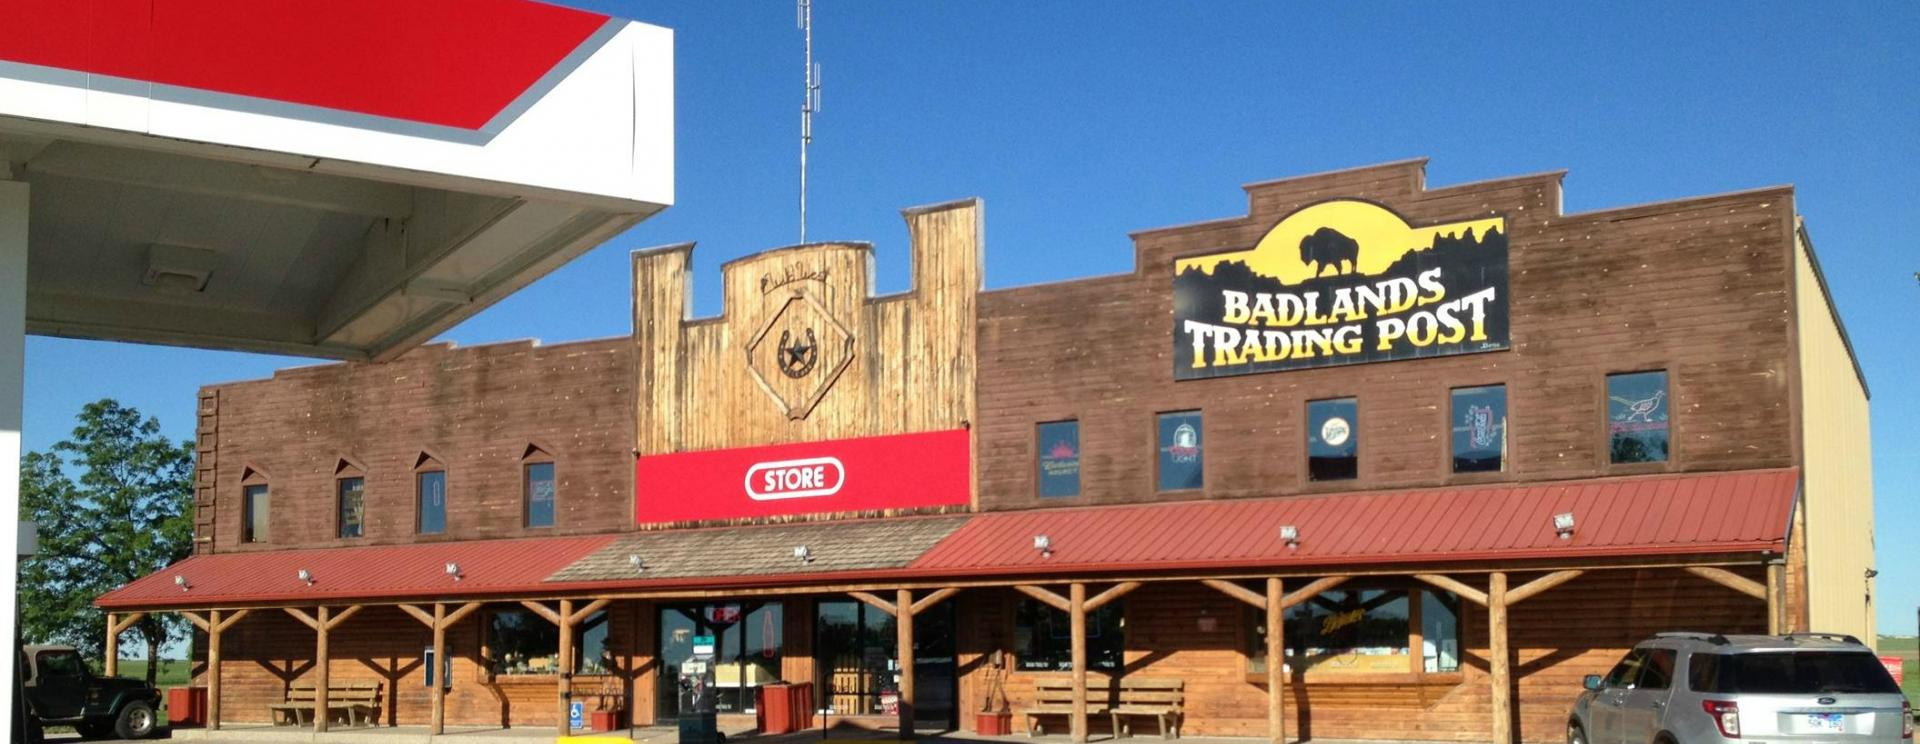 Badlands Trading Post